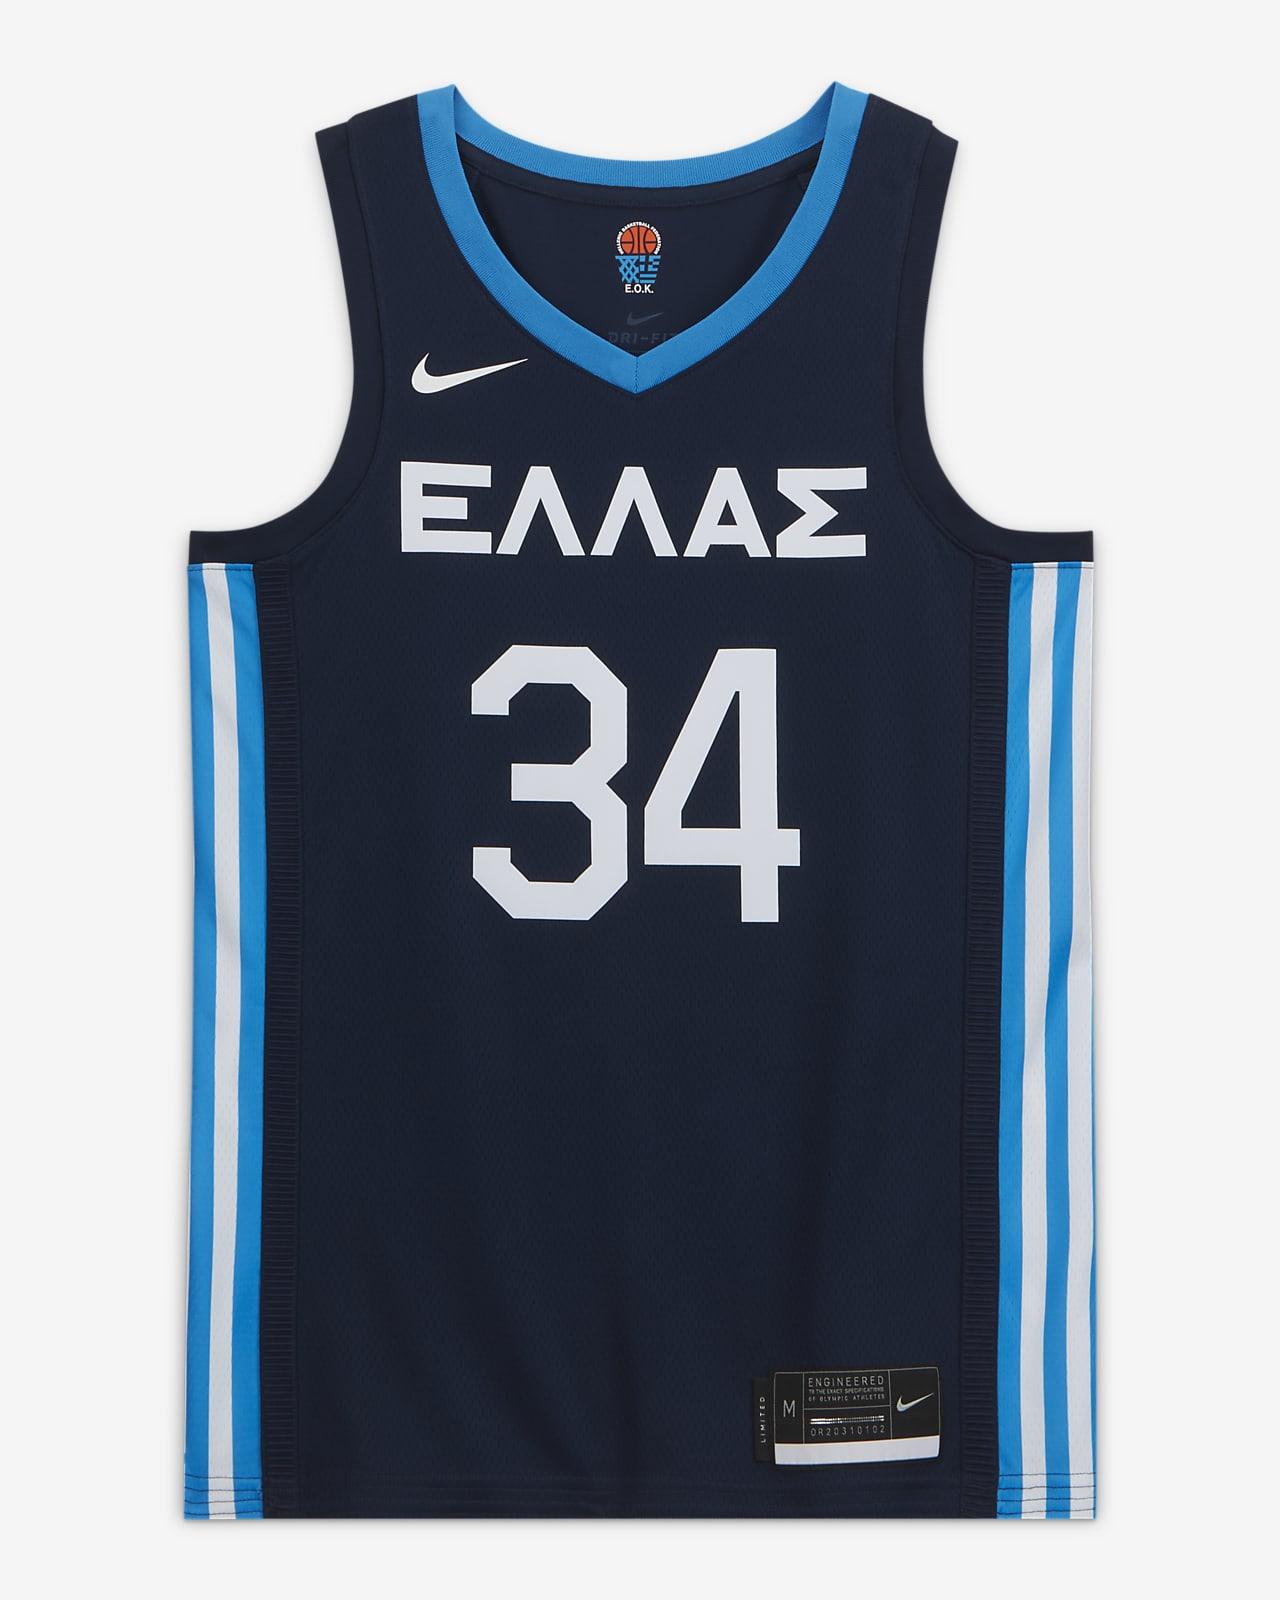 Greece (Road) Nike Limited Men's Basketball Jersey